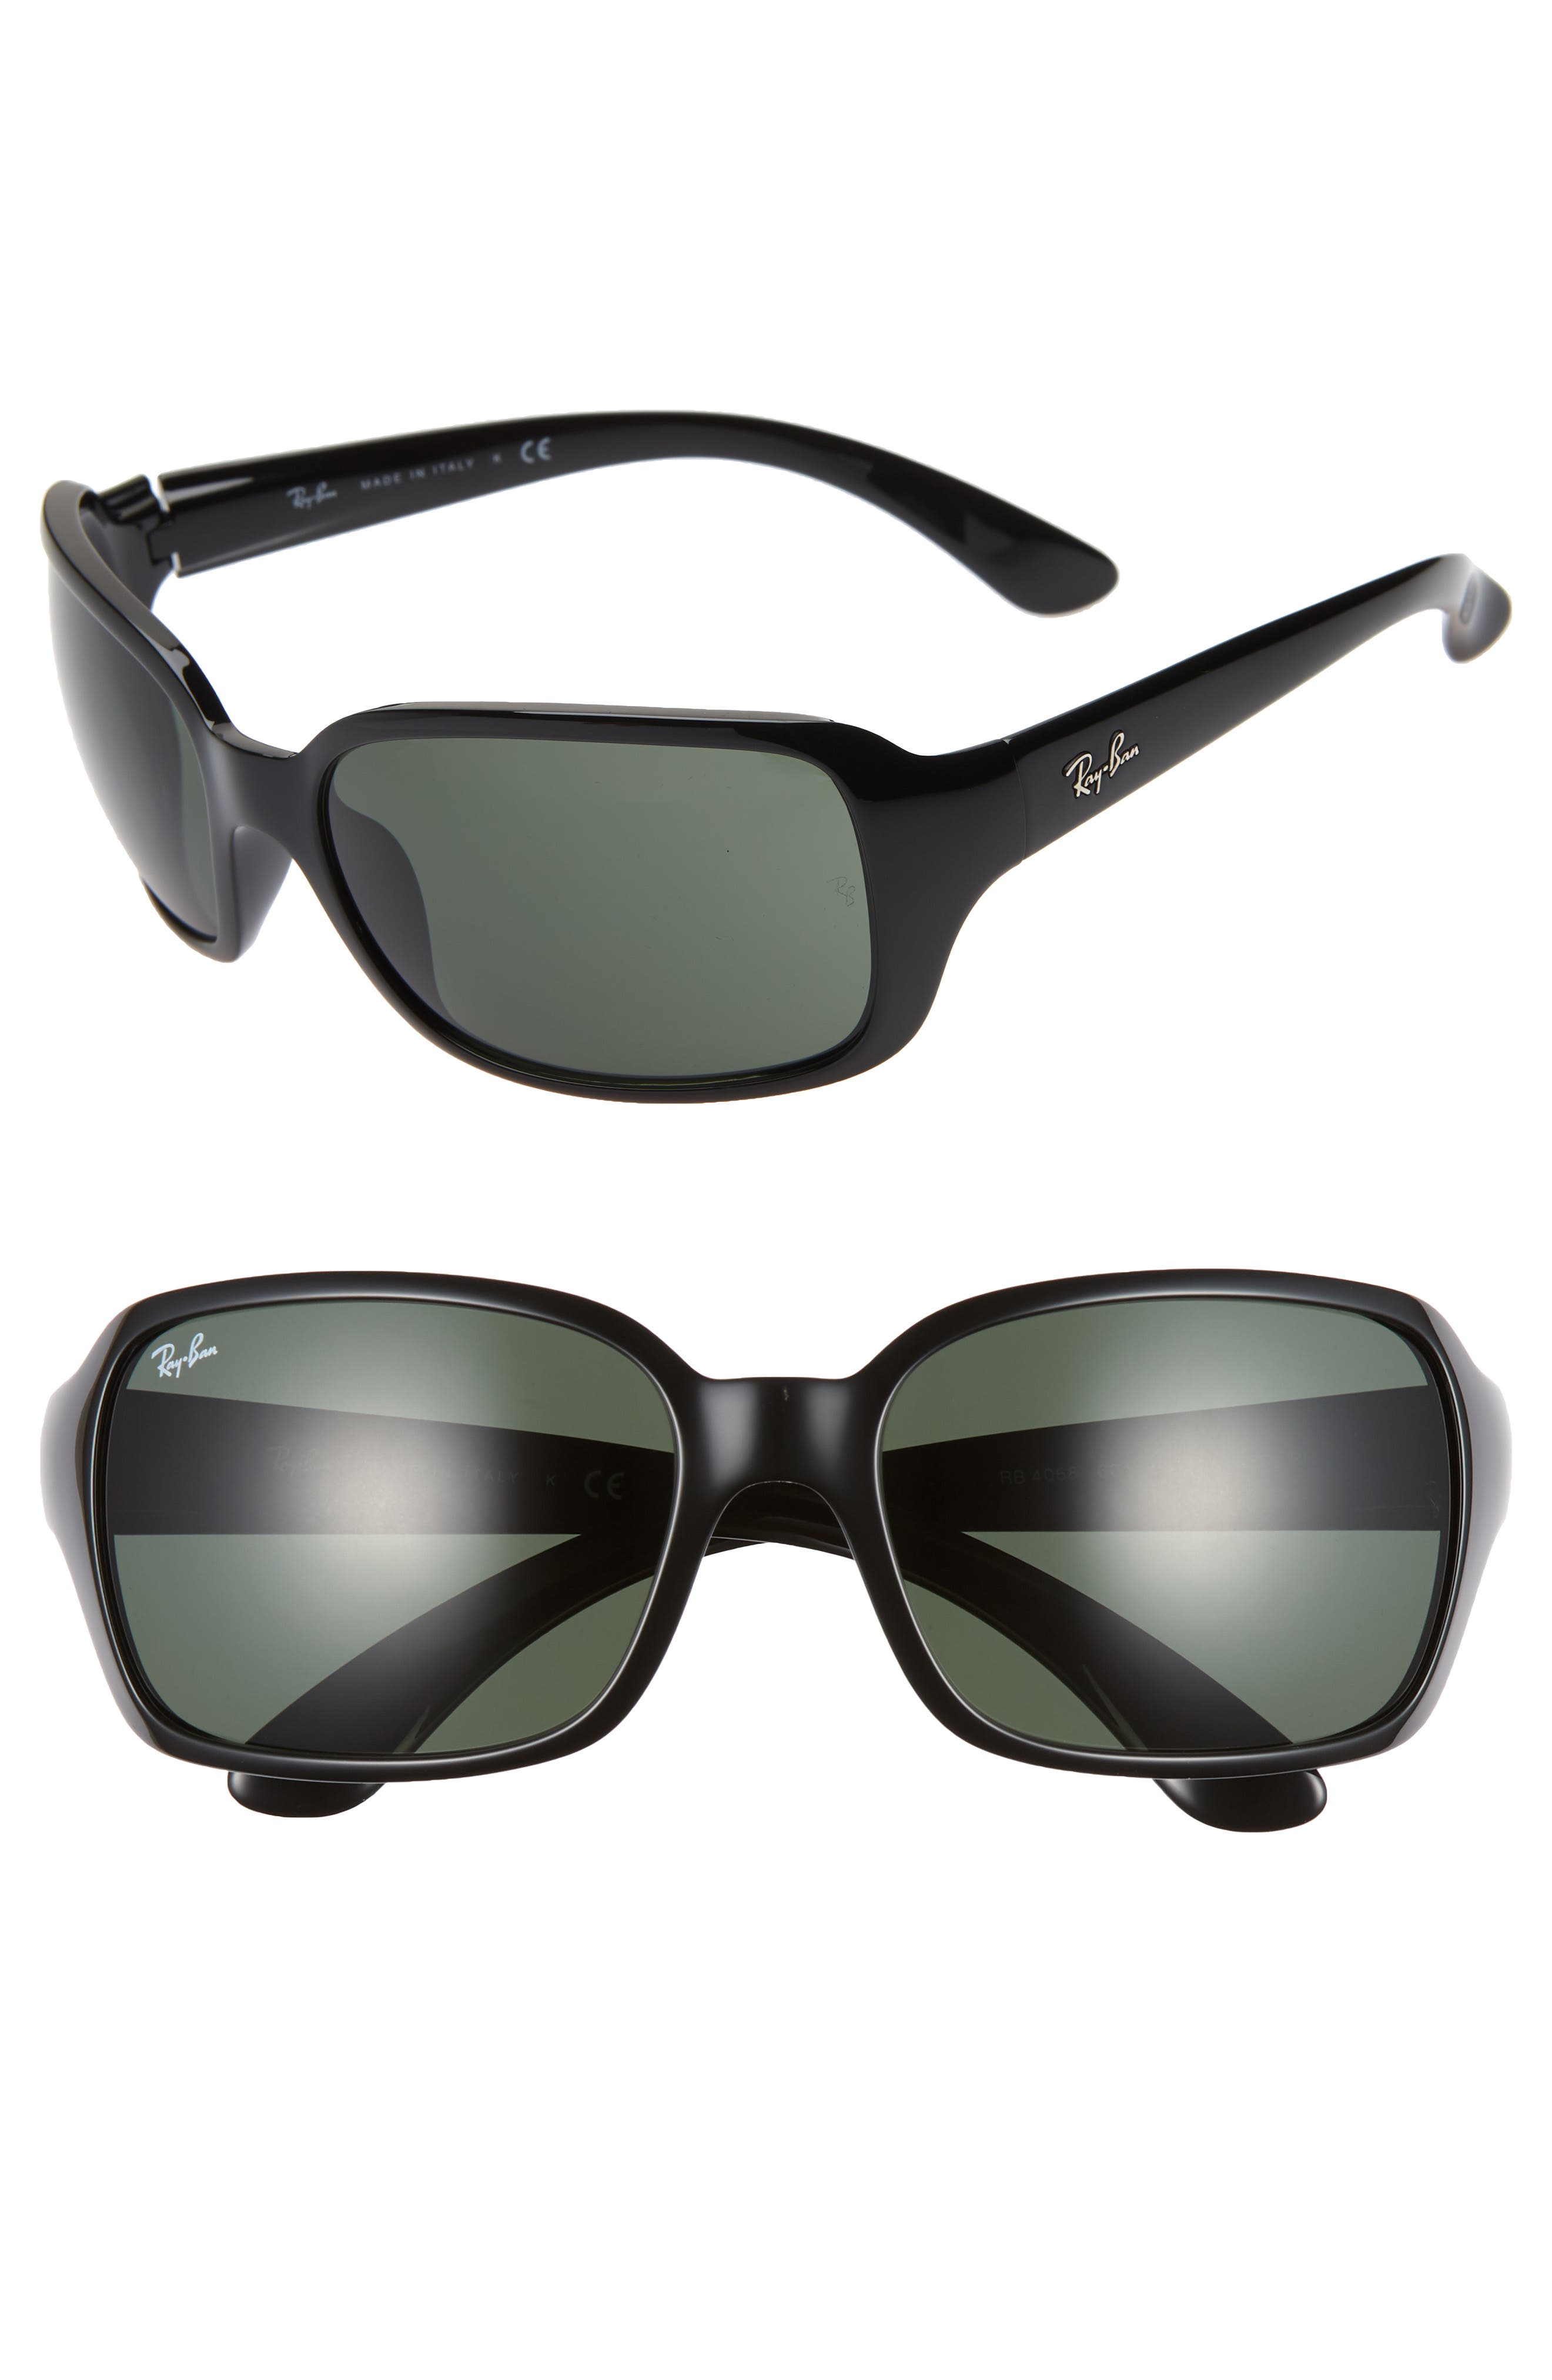 Ray-Ban 60Mm Wrap Sunglasses - Black/ Green Solid